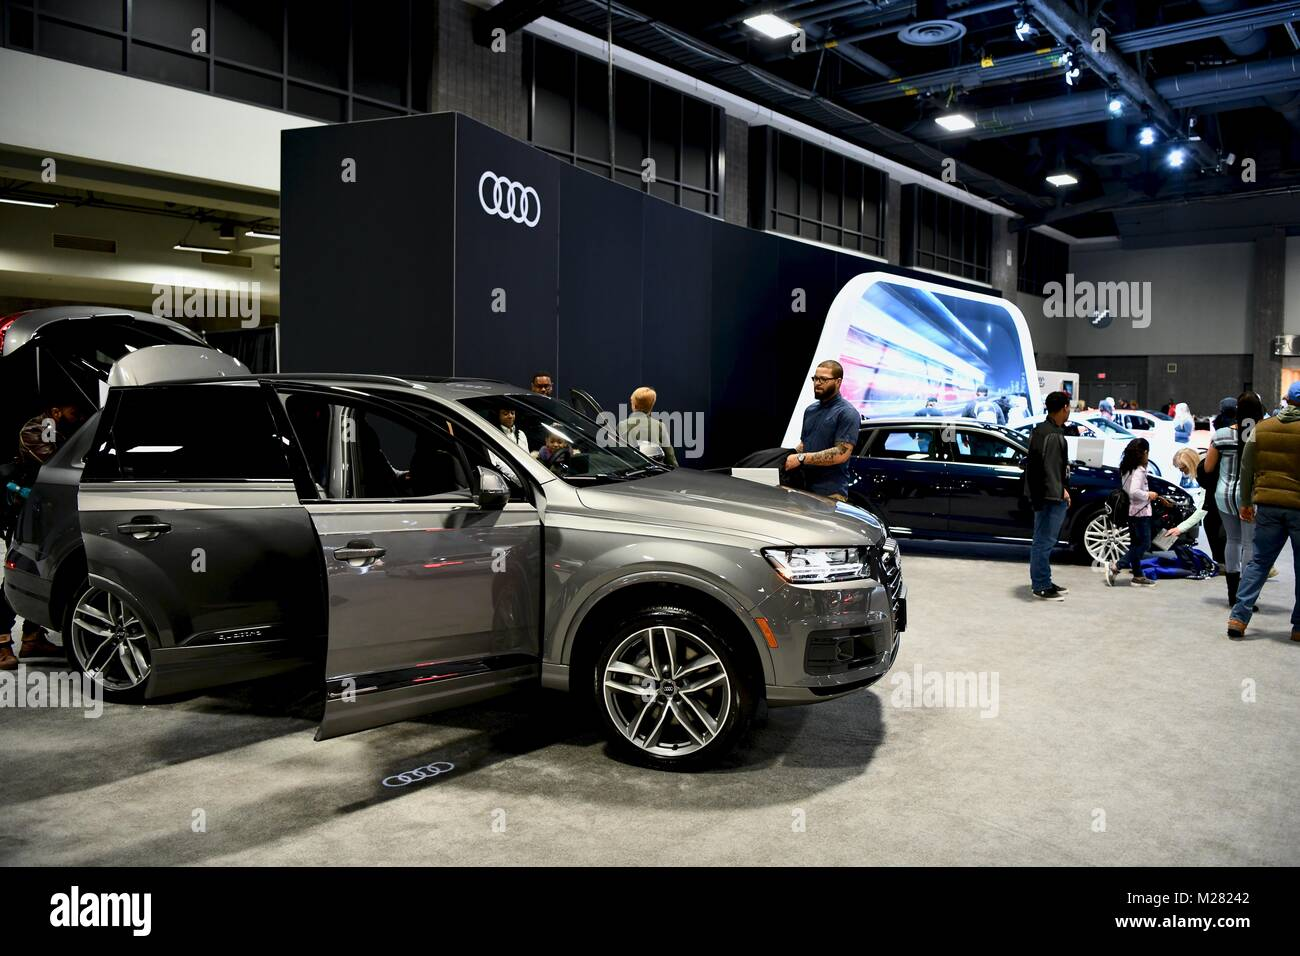 Audi Cars At The Washington Auto Show Washington DC USA Stock - Washington dc car show discount tickets